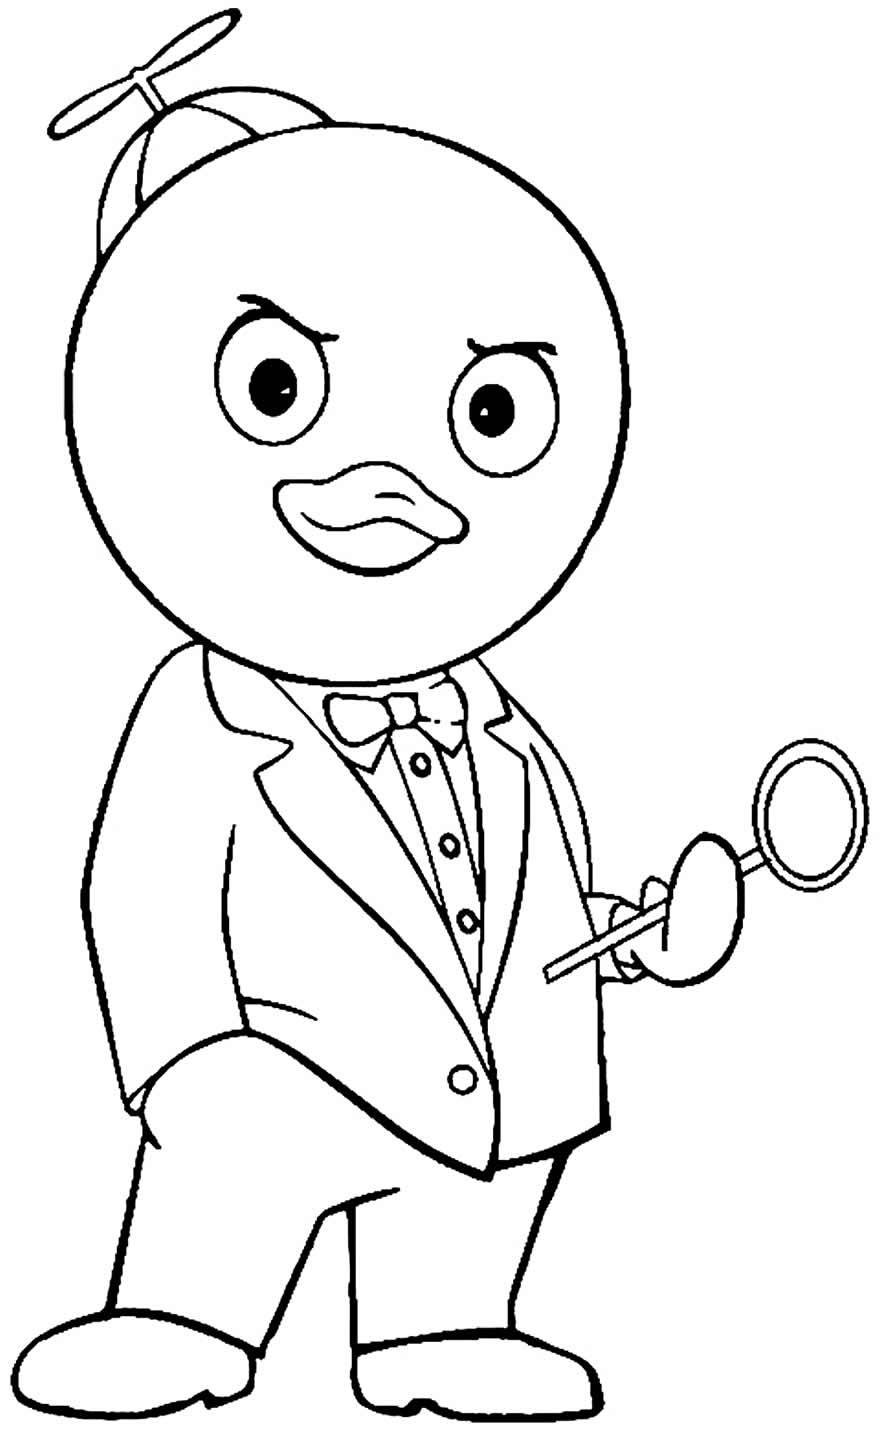 Imagem de Backyardigans para colorir